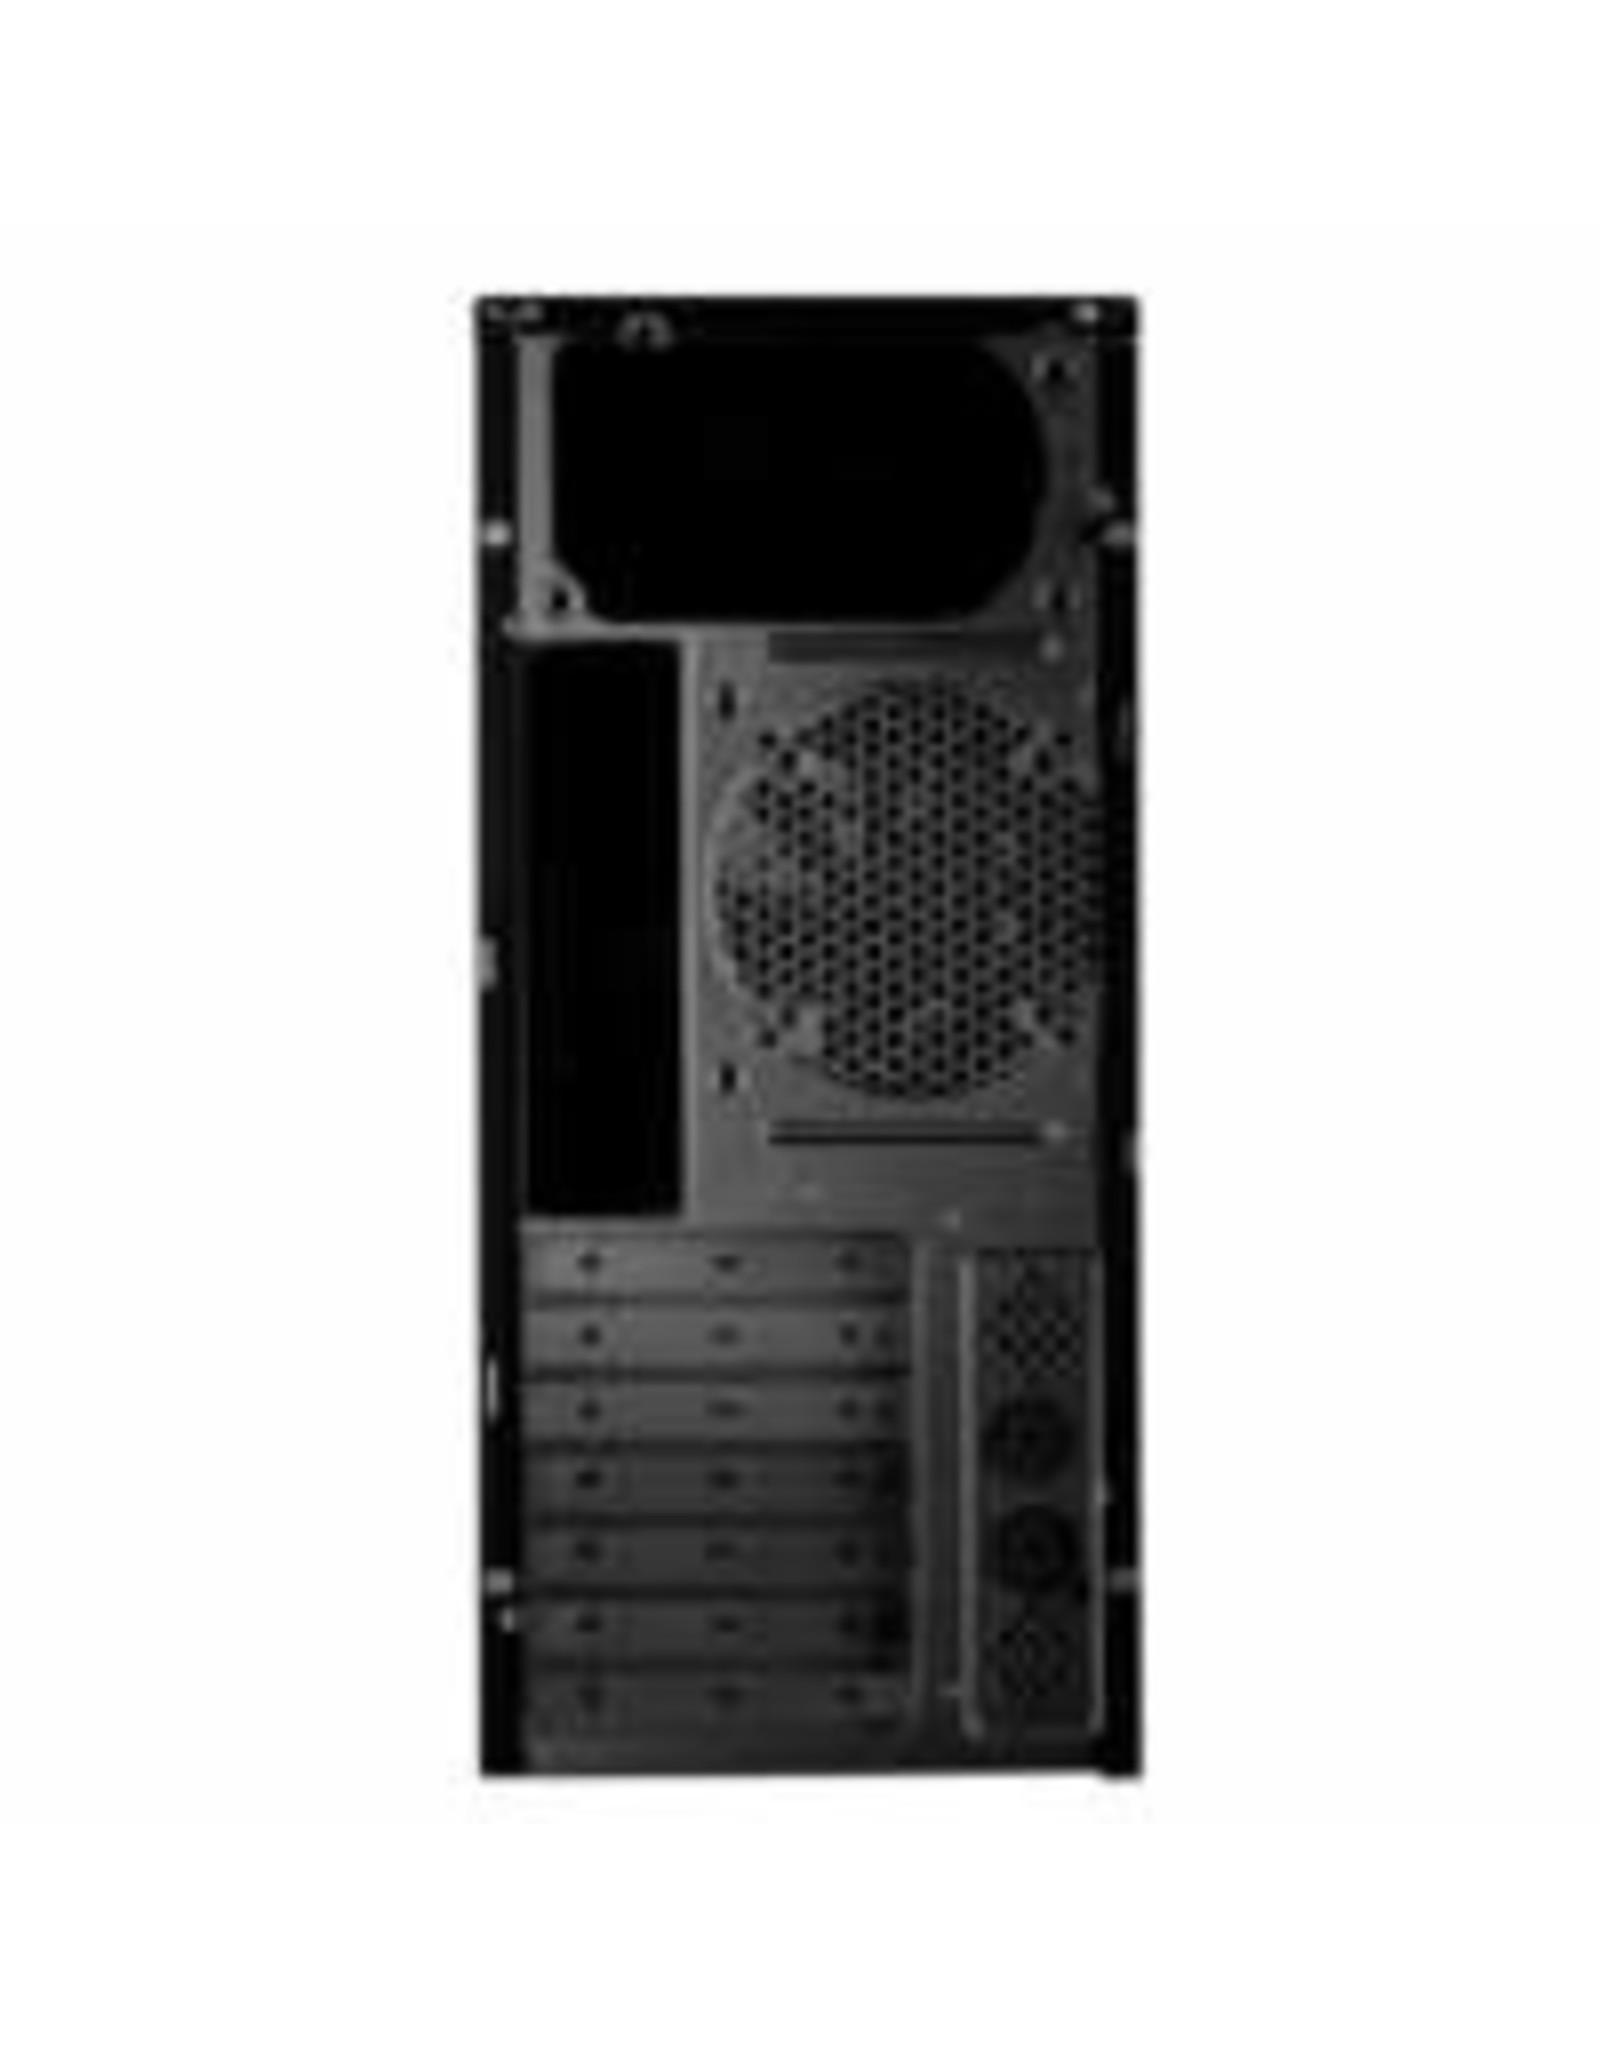 Antec Case  VSK 4000B-U3 ATX  / USB 3.0 / NO PSU